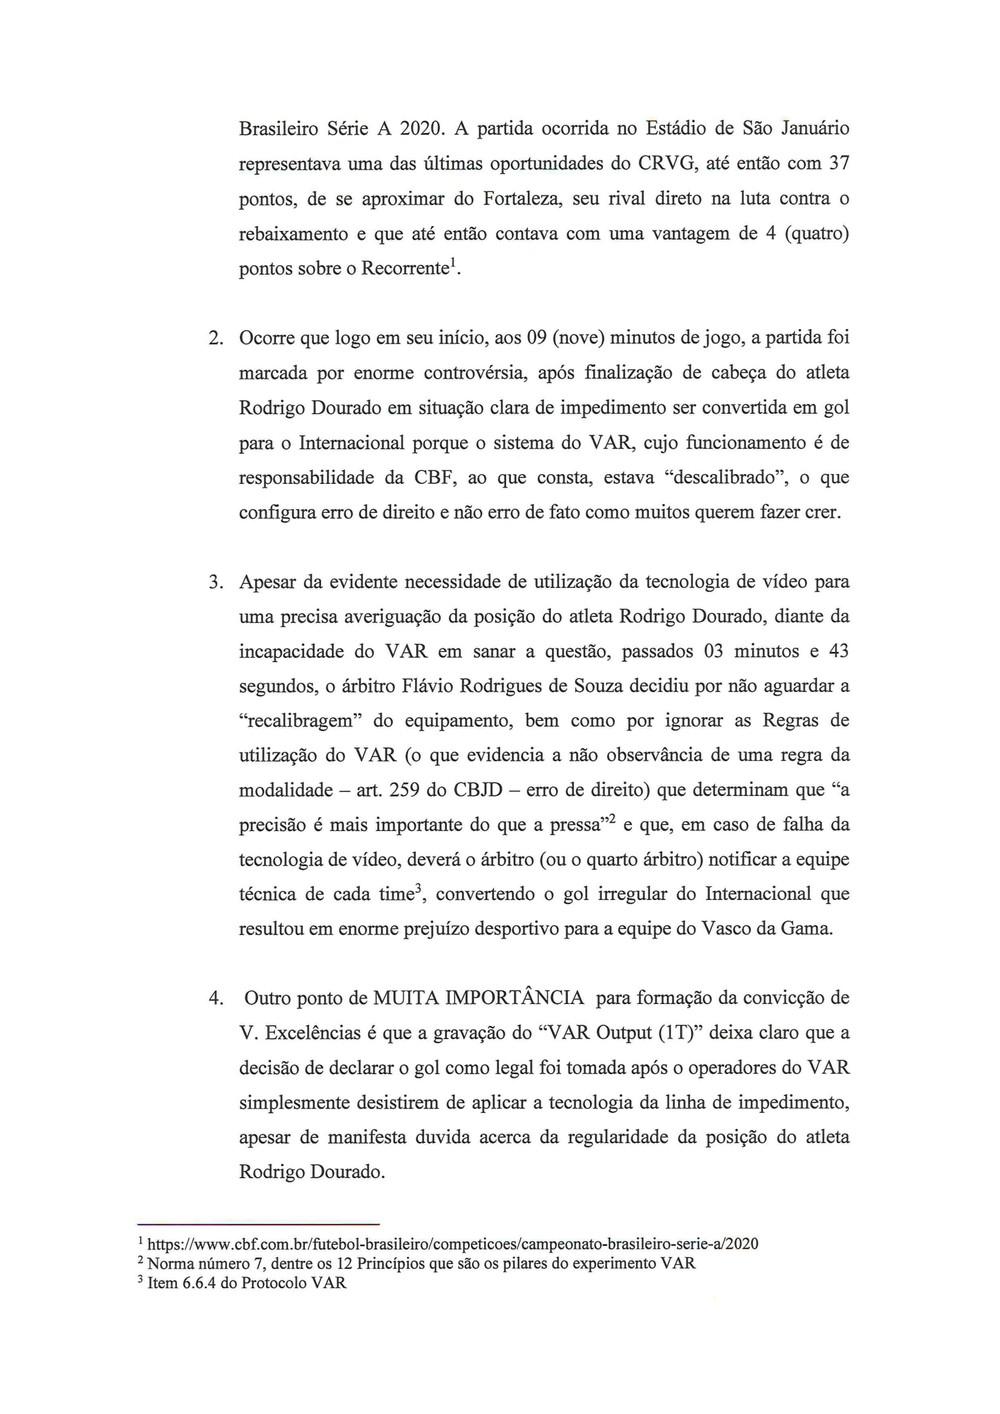 stjd-medida-inominada-vasco-x-inter-03